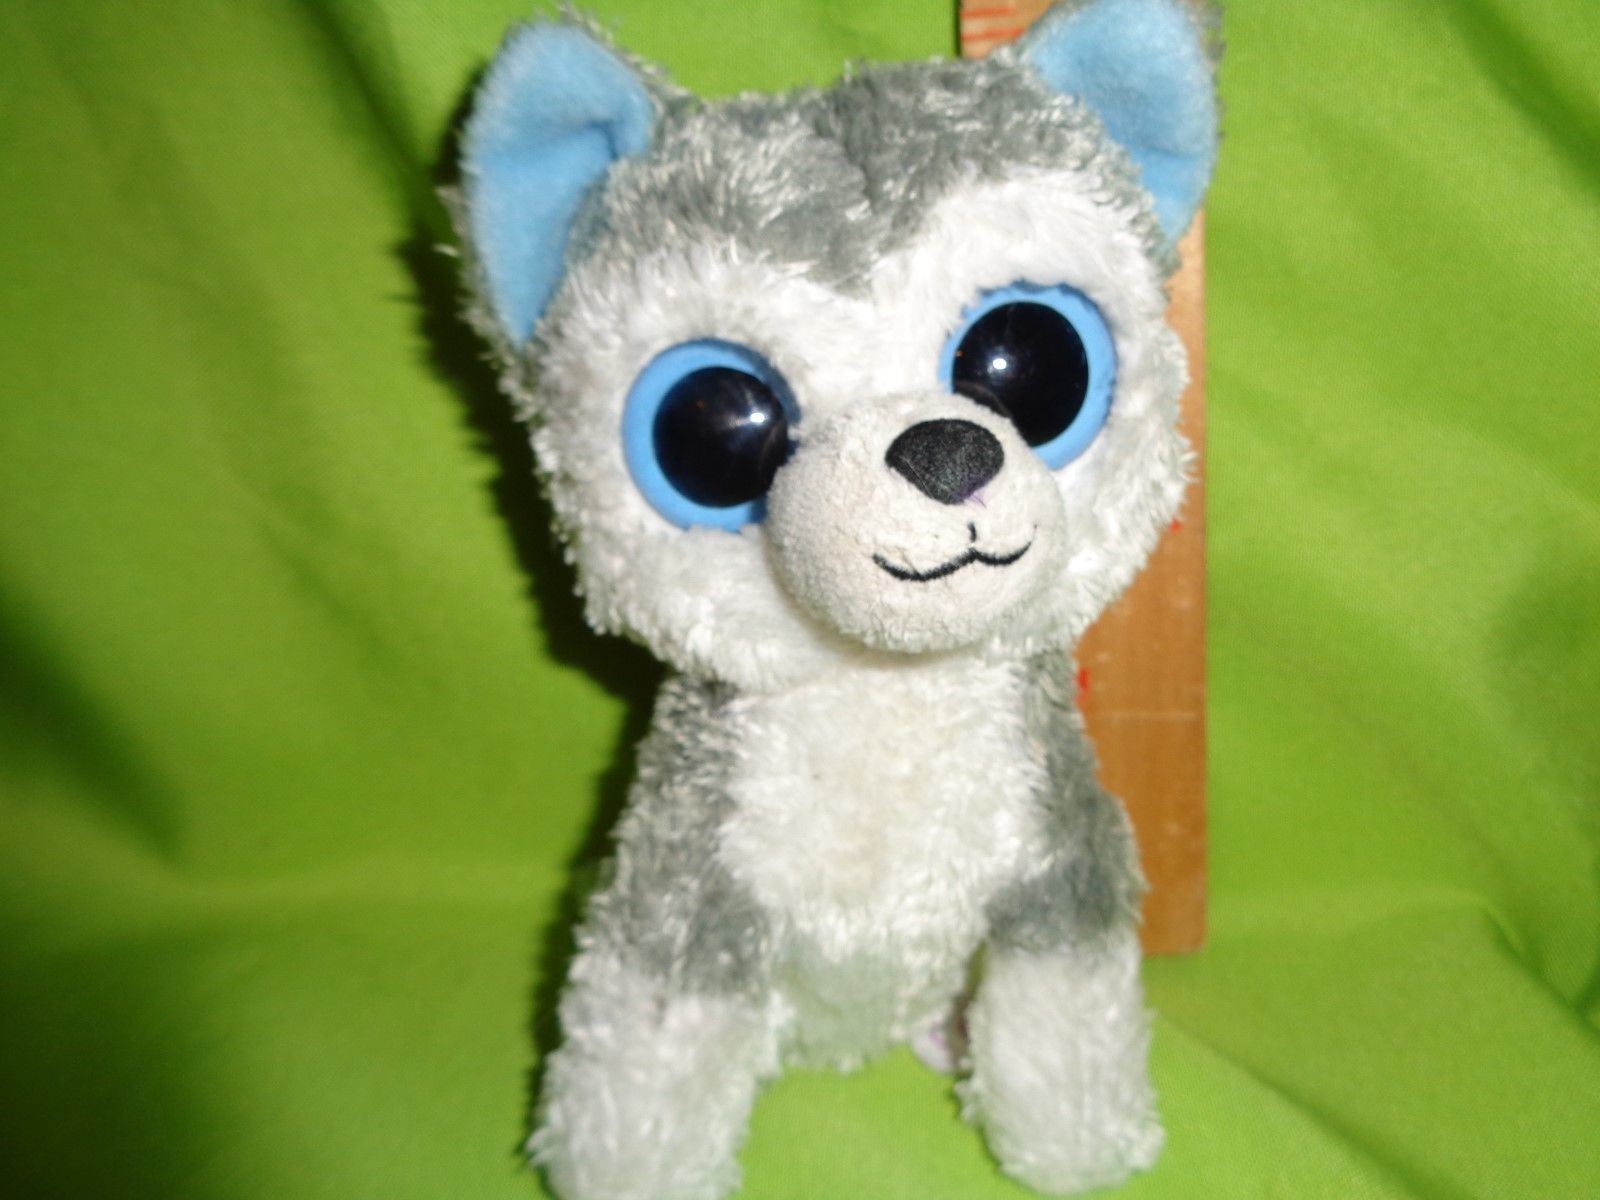 907ac0e29b3 TY Beanie Boo Husky Dog Slush Plush Stuffed and 37 similar items. S l1600